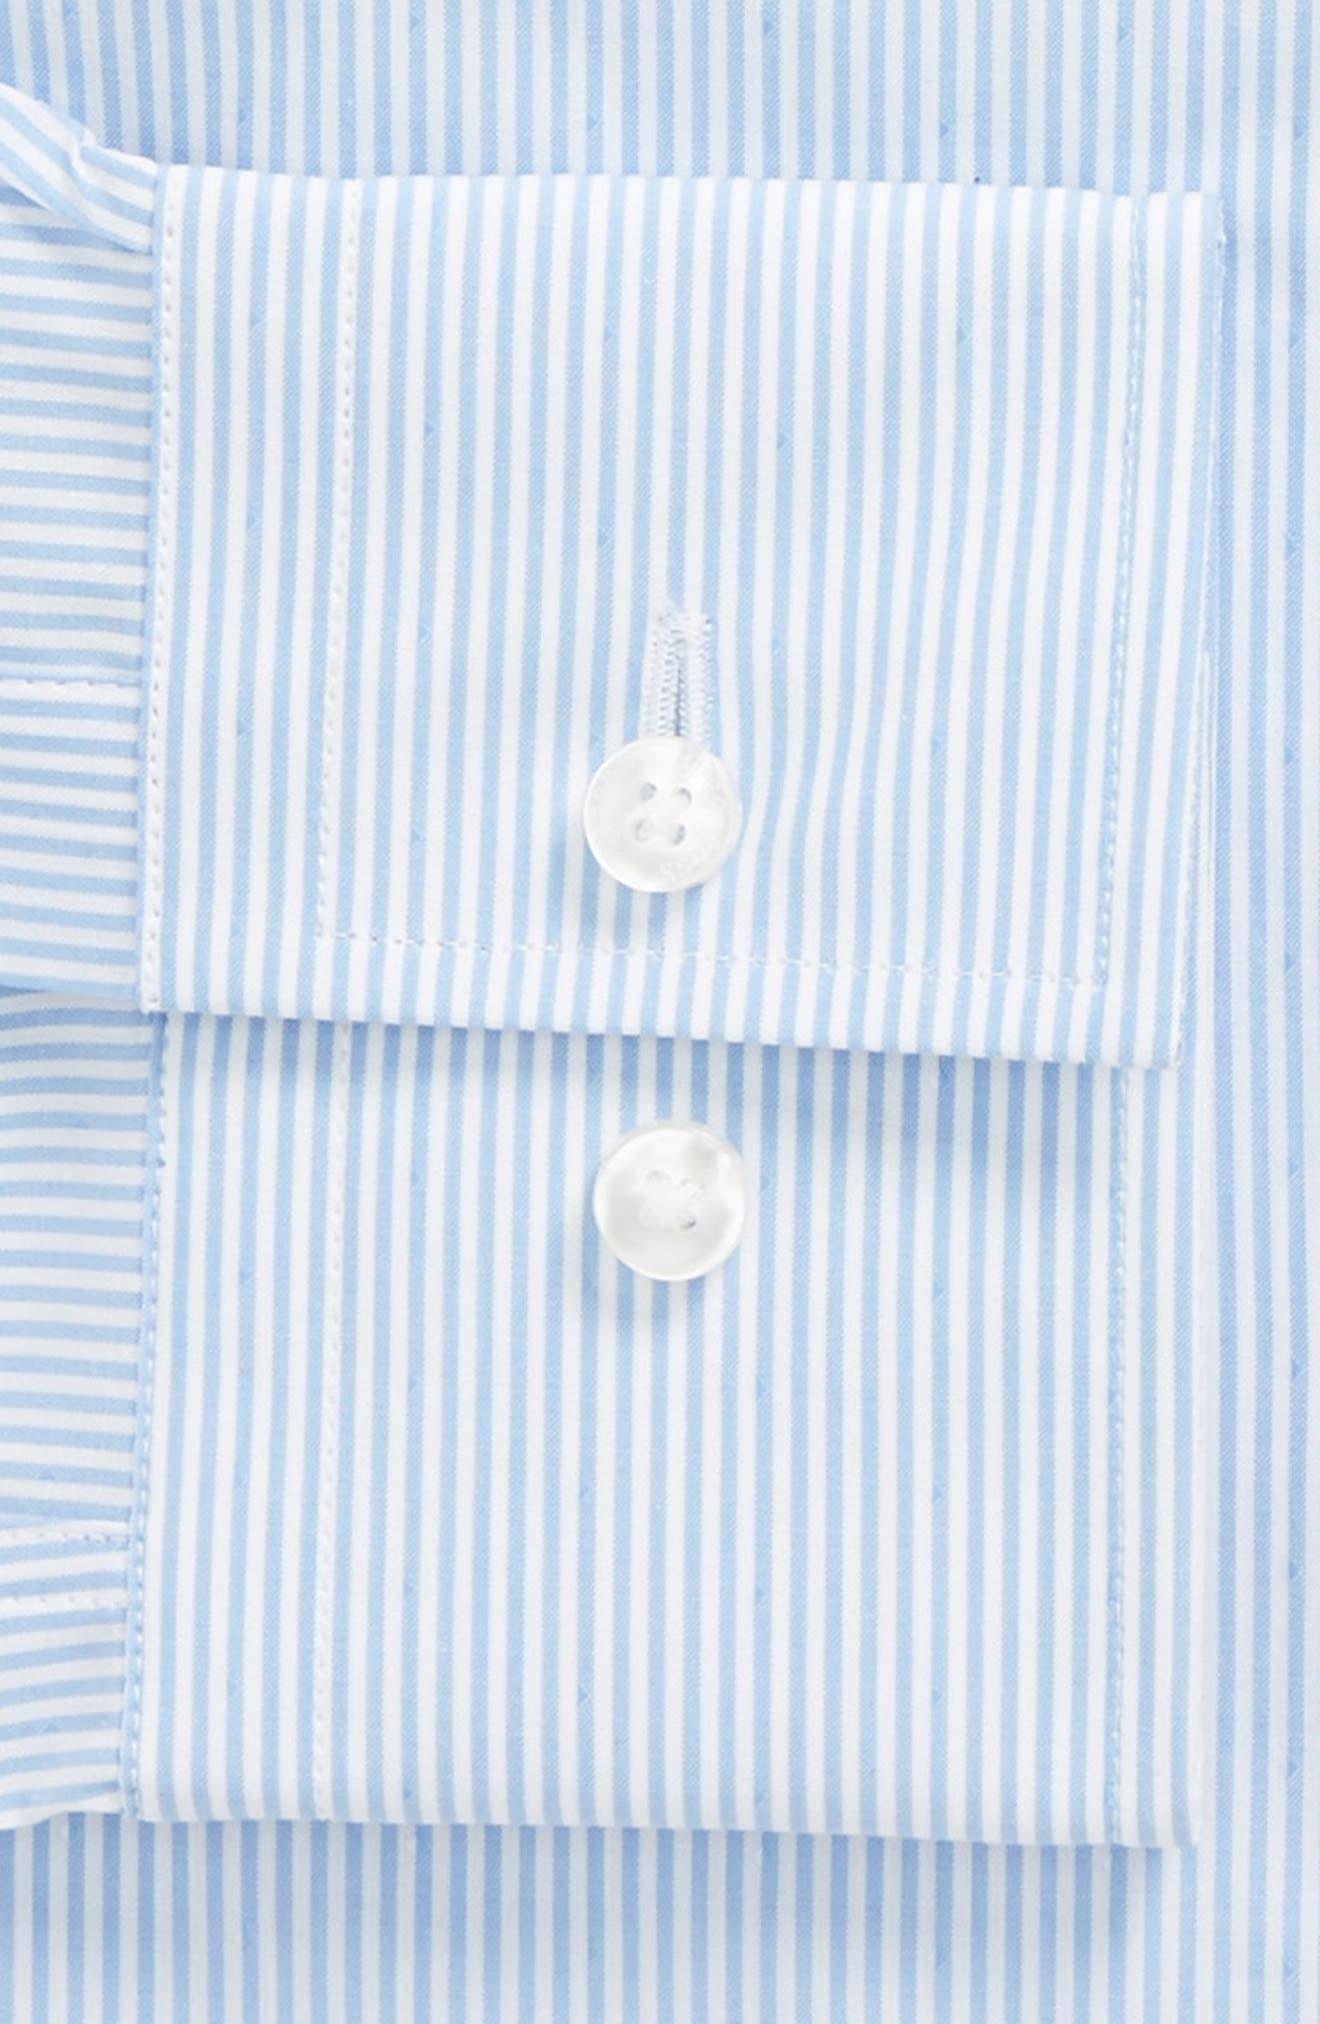 Jason Slim Fit Stripe Dress Shirt,                             Alternate thumbnail 2, color,                             Blue